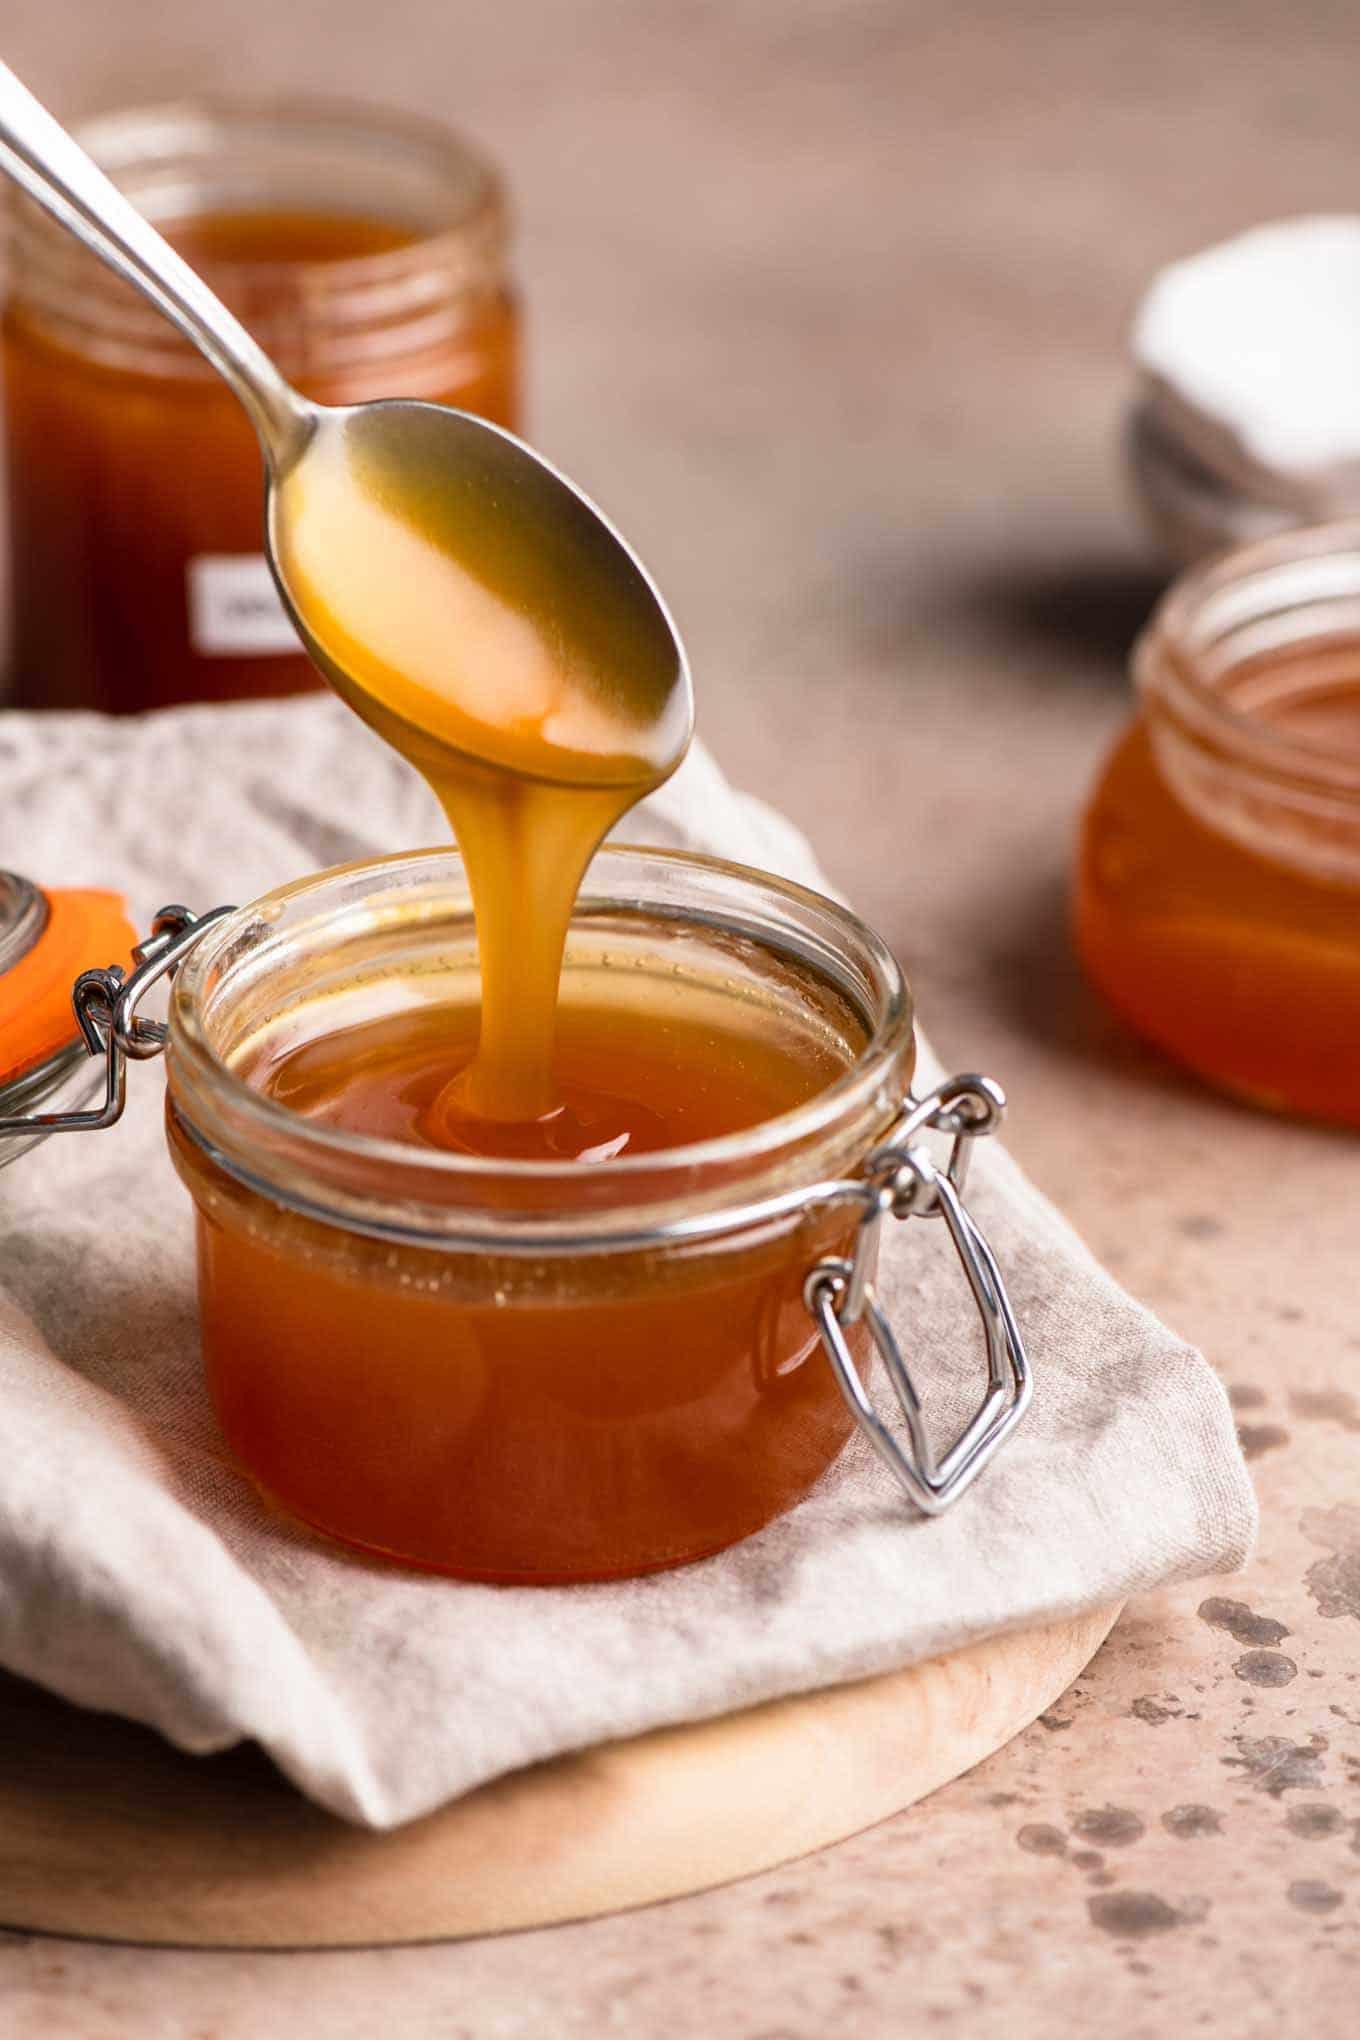 vegan caramel sauce in three glass jars